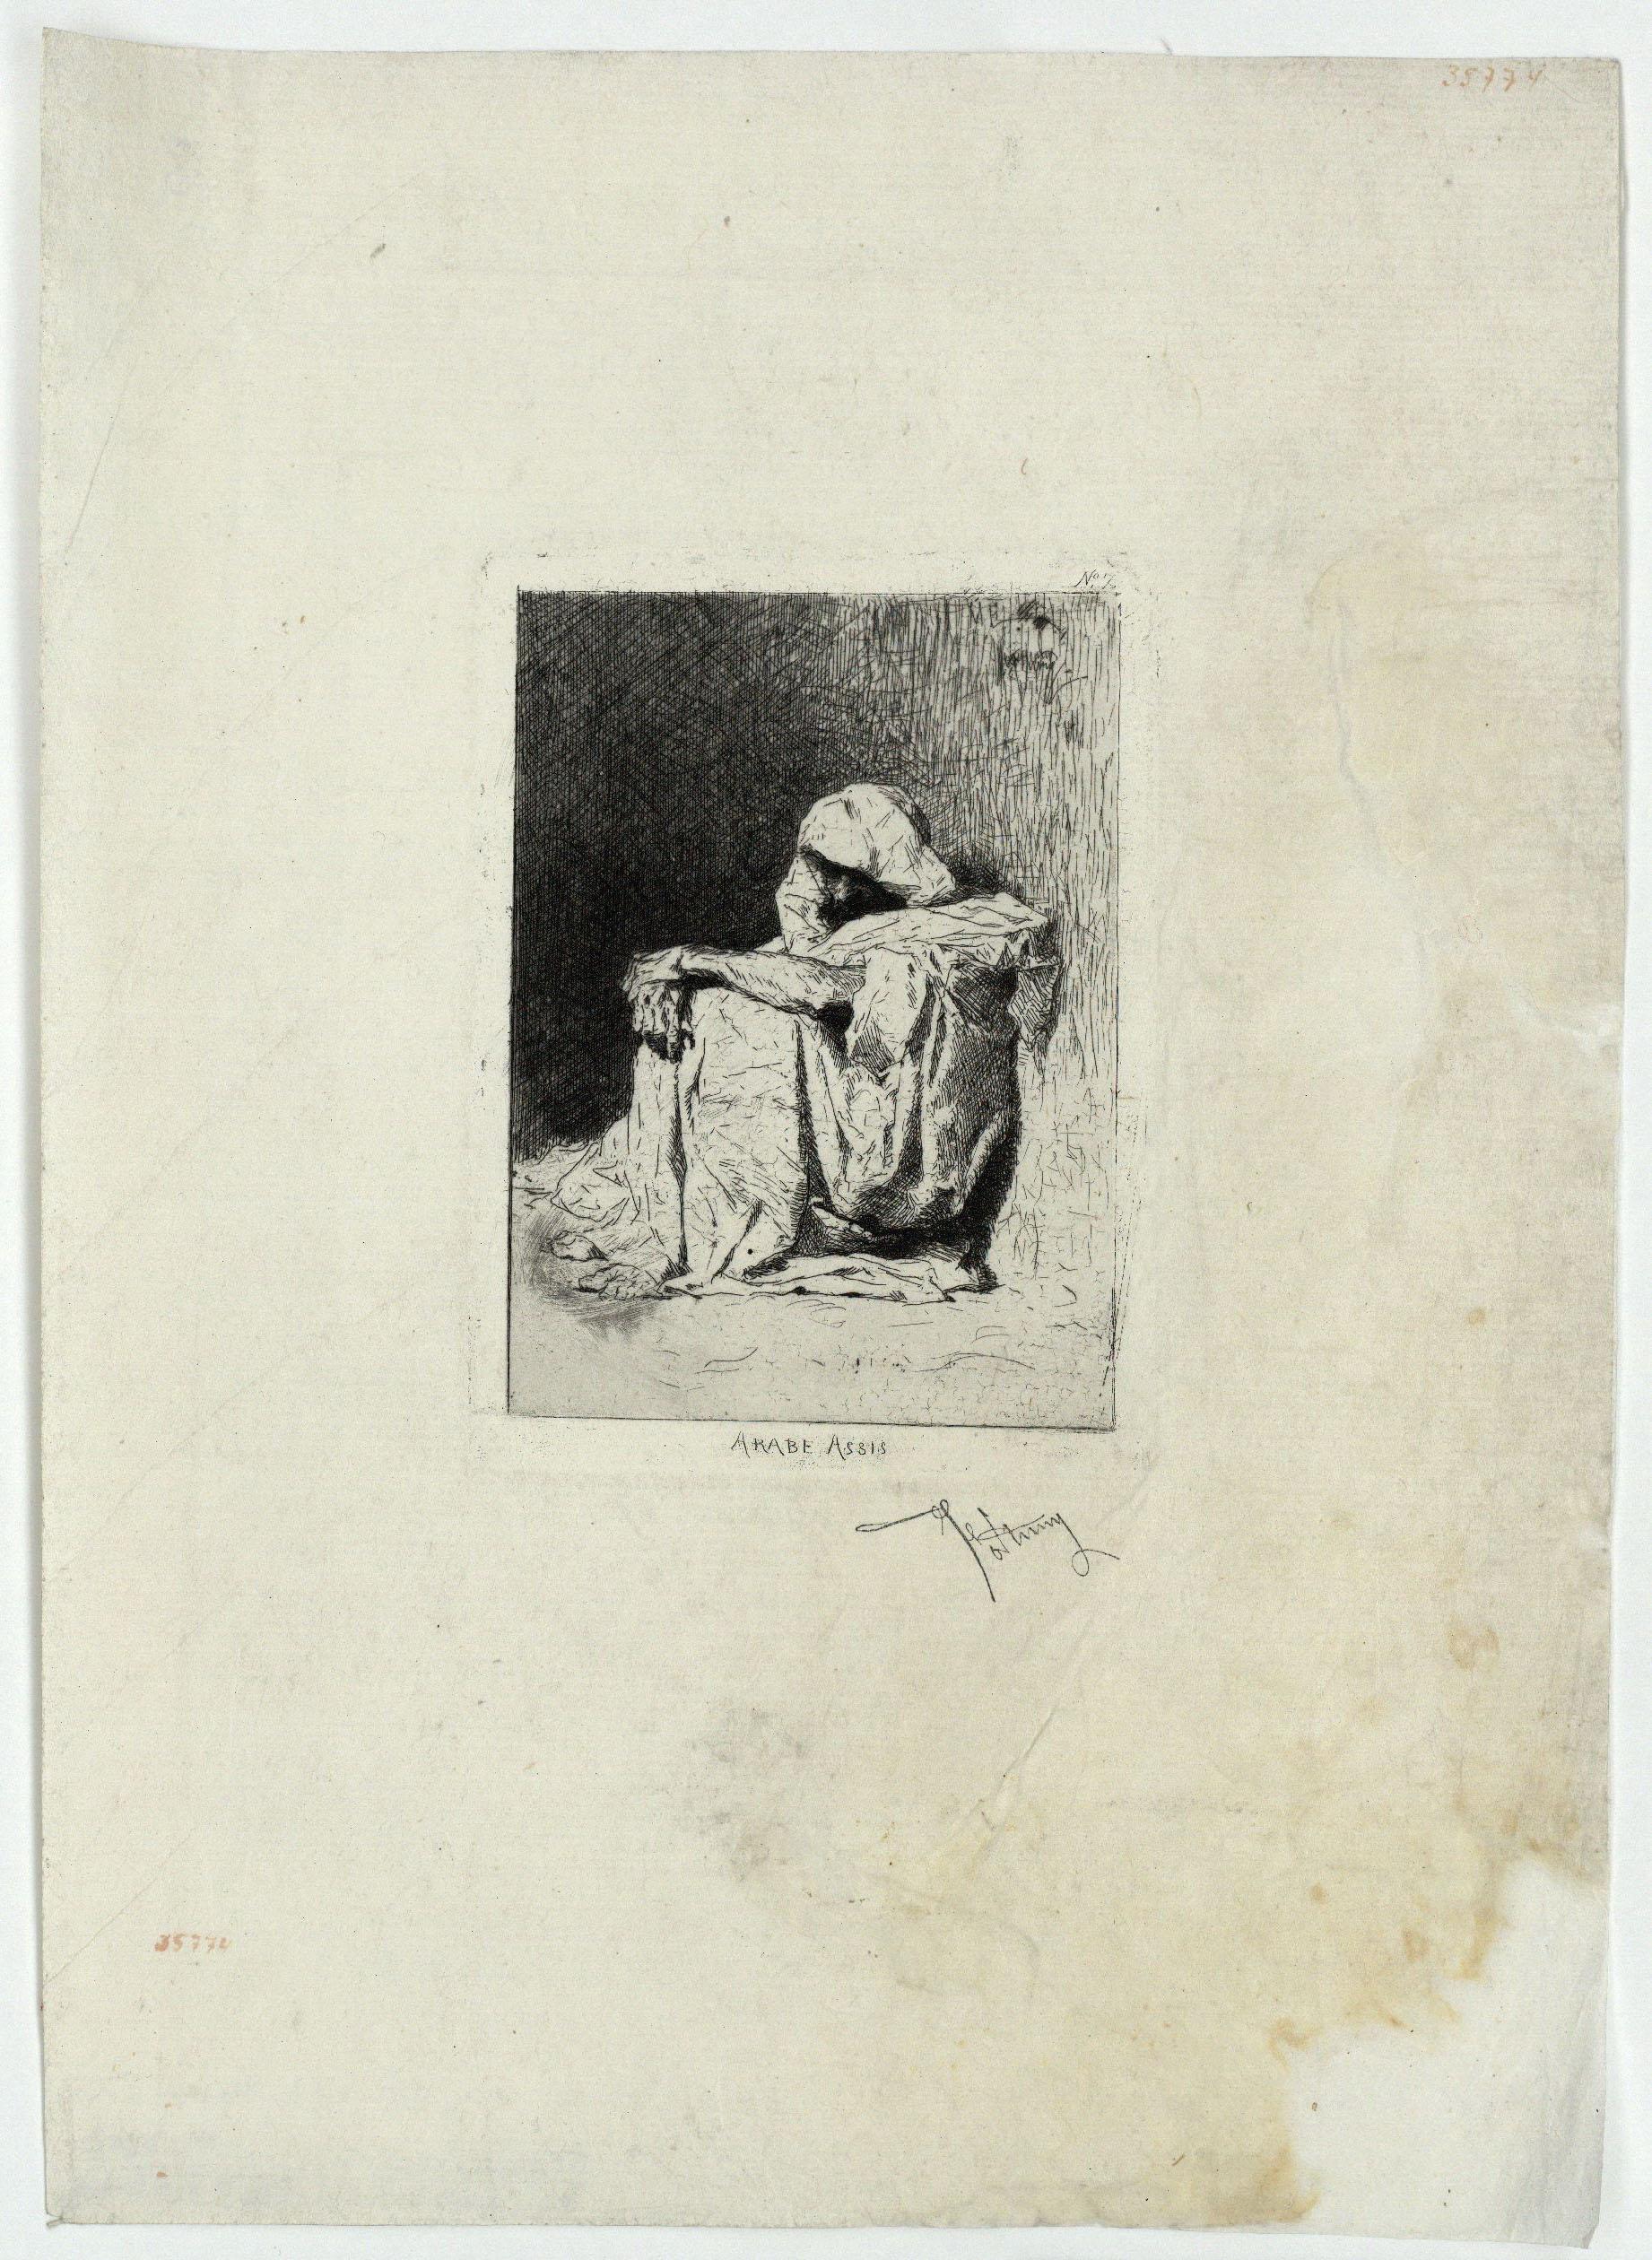 Marià Fortuny - Arabe assis (Àrab assegut) - [no-dating]